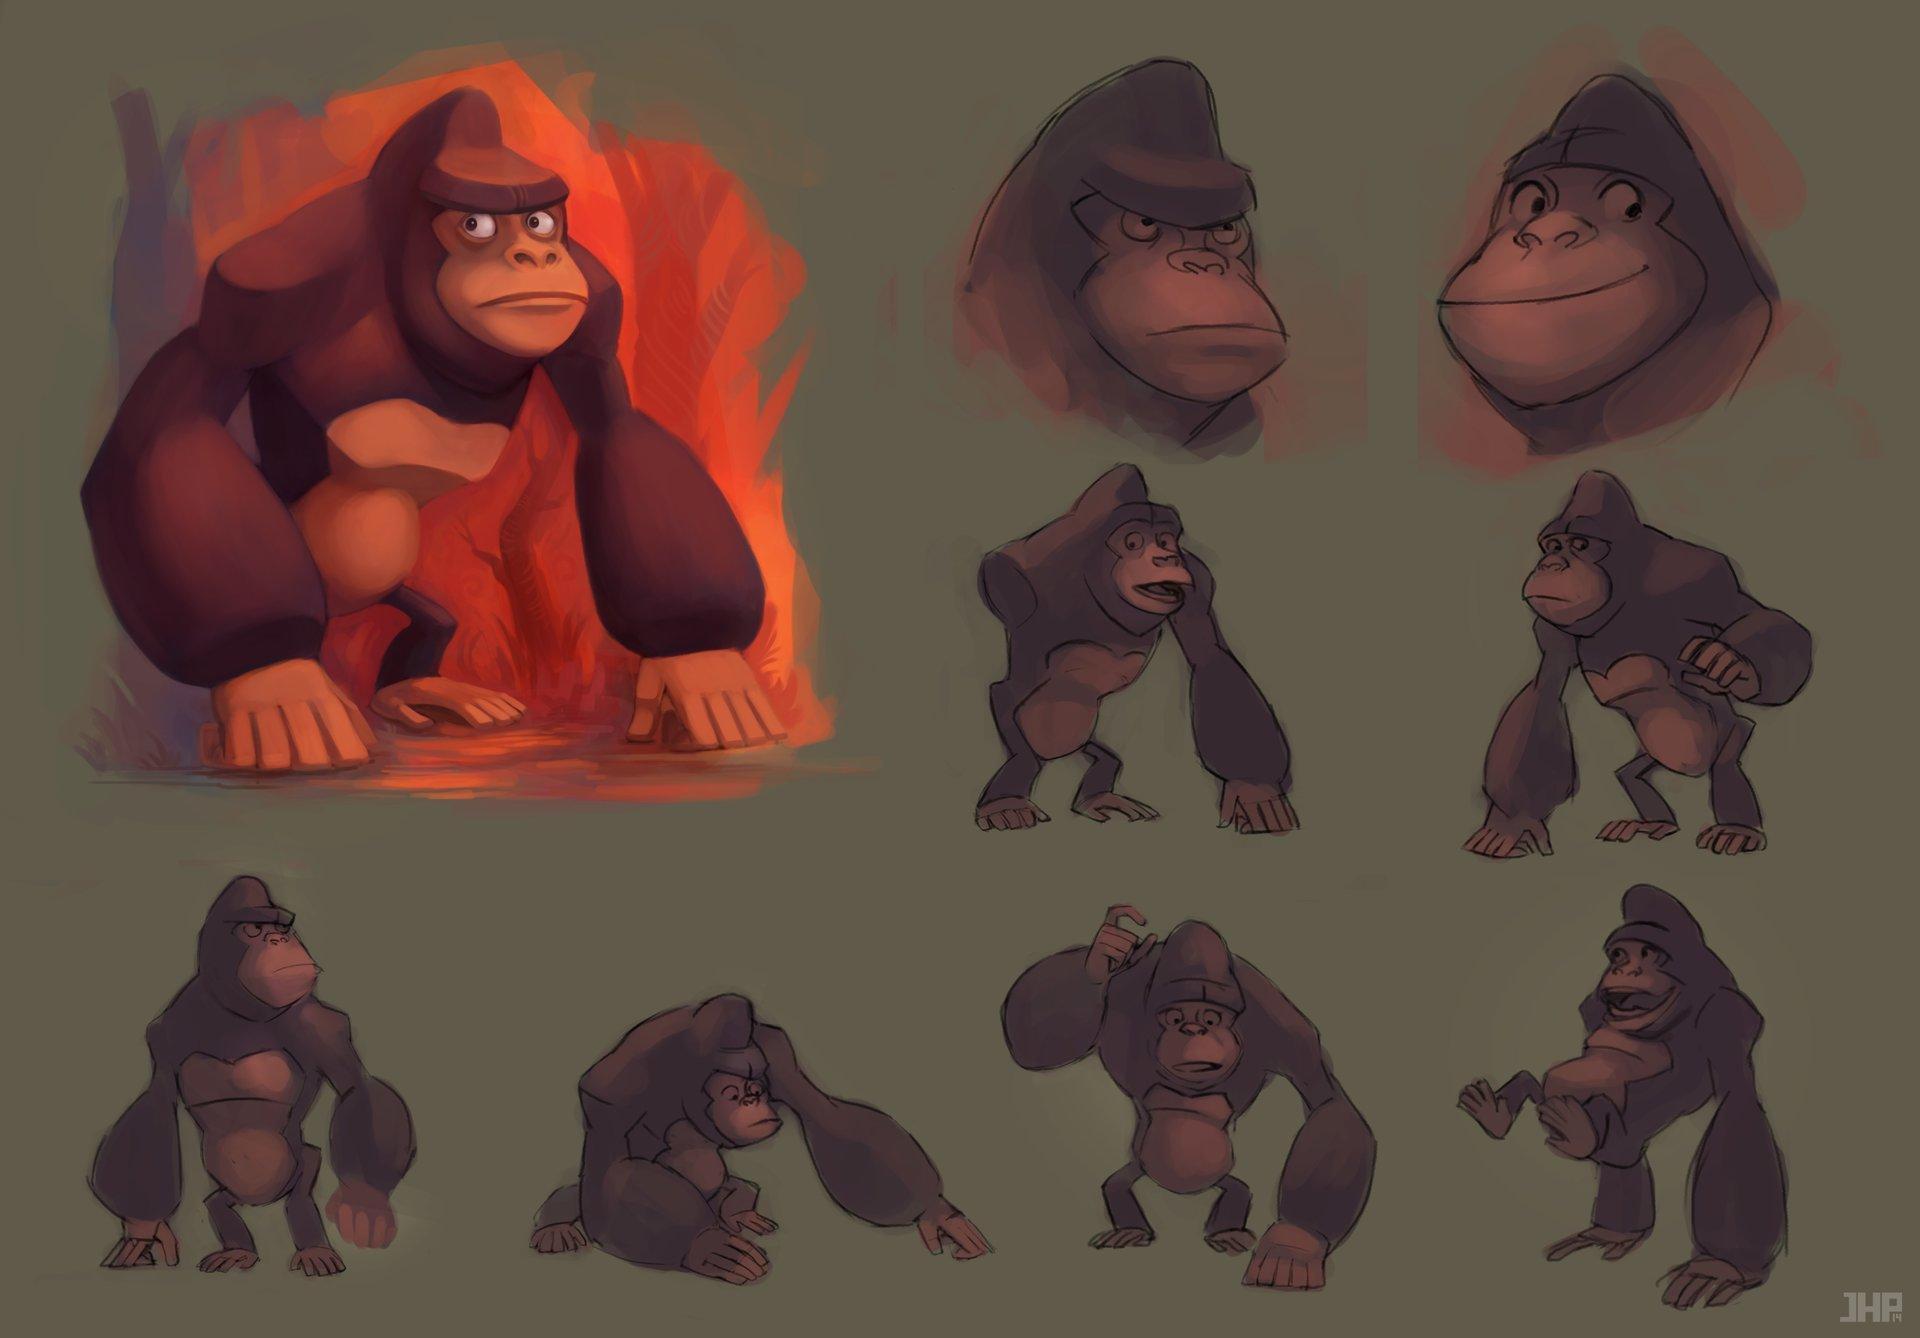 Joao henrique pacheco gorila 4